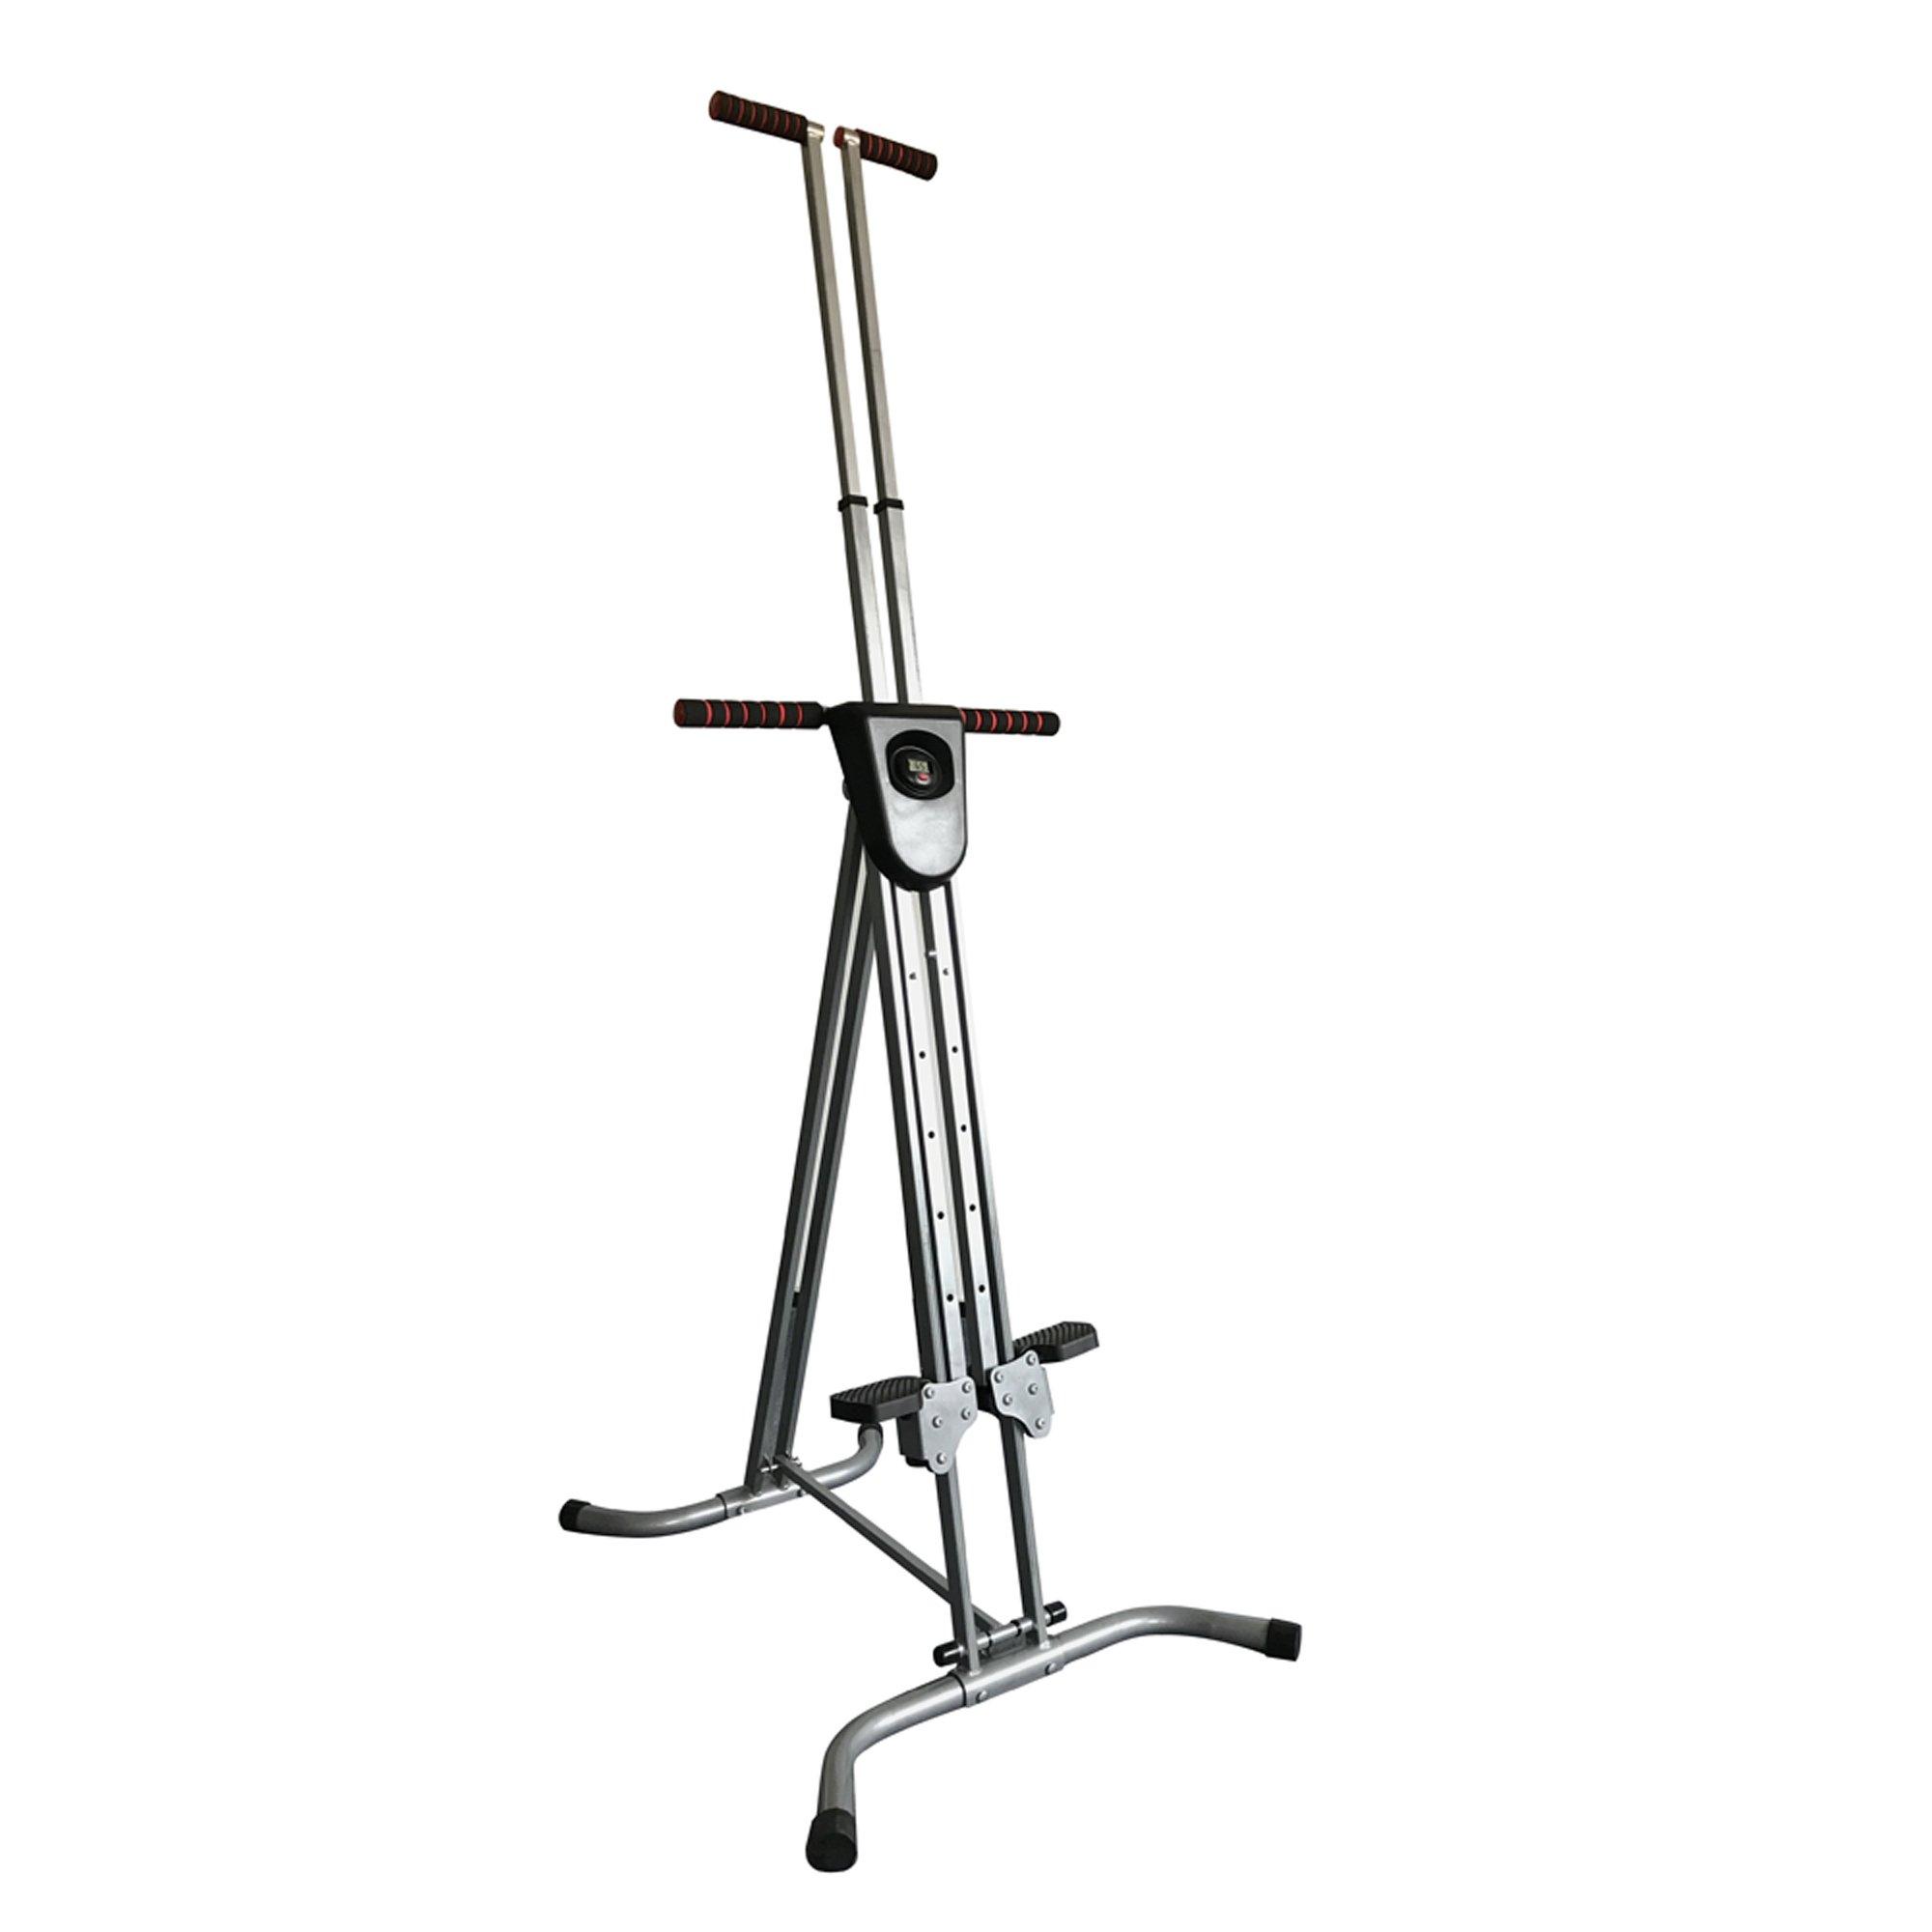 Enshey Vertical Climber Exercise Climbing Machine Stepper Cardio Exercise Total Body Workout Climber Machine Folding Climbing Machine Fitness for Home GYM Step Climber Exercise Machine by Enshey